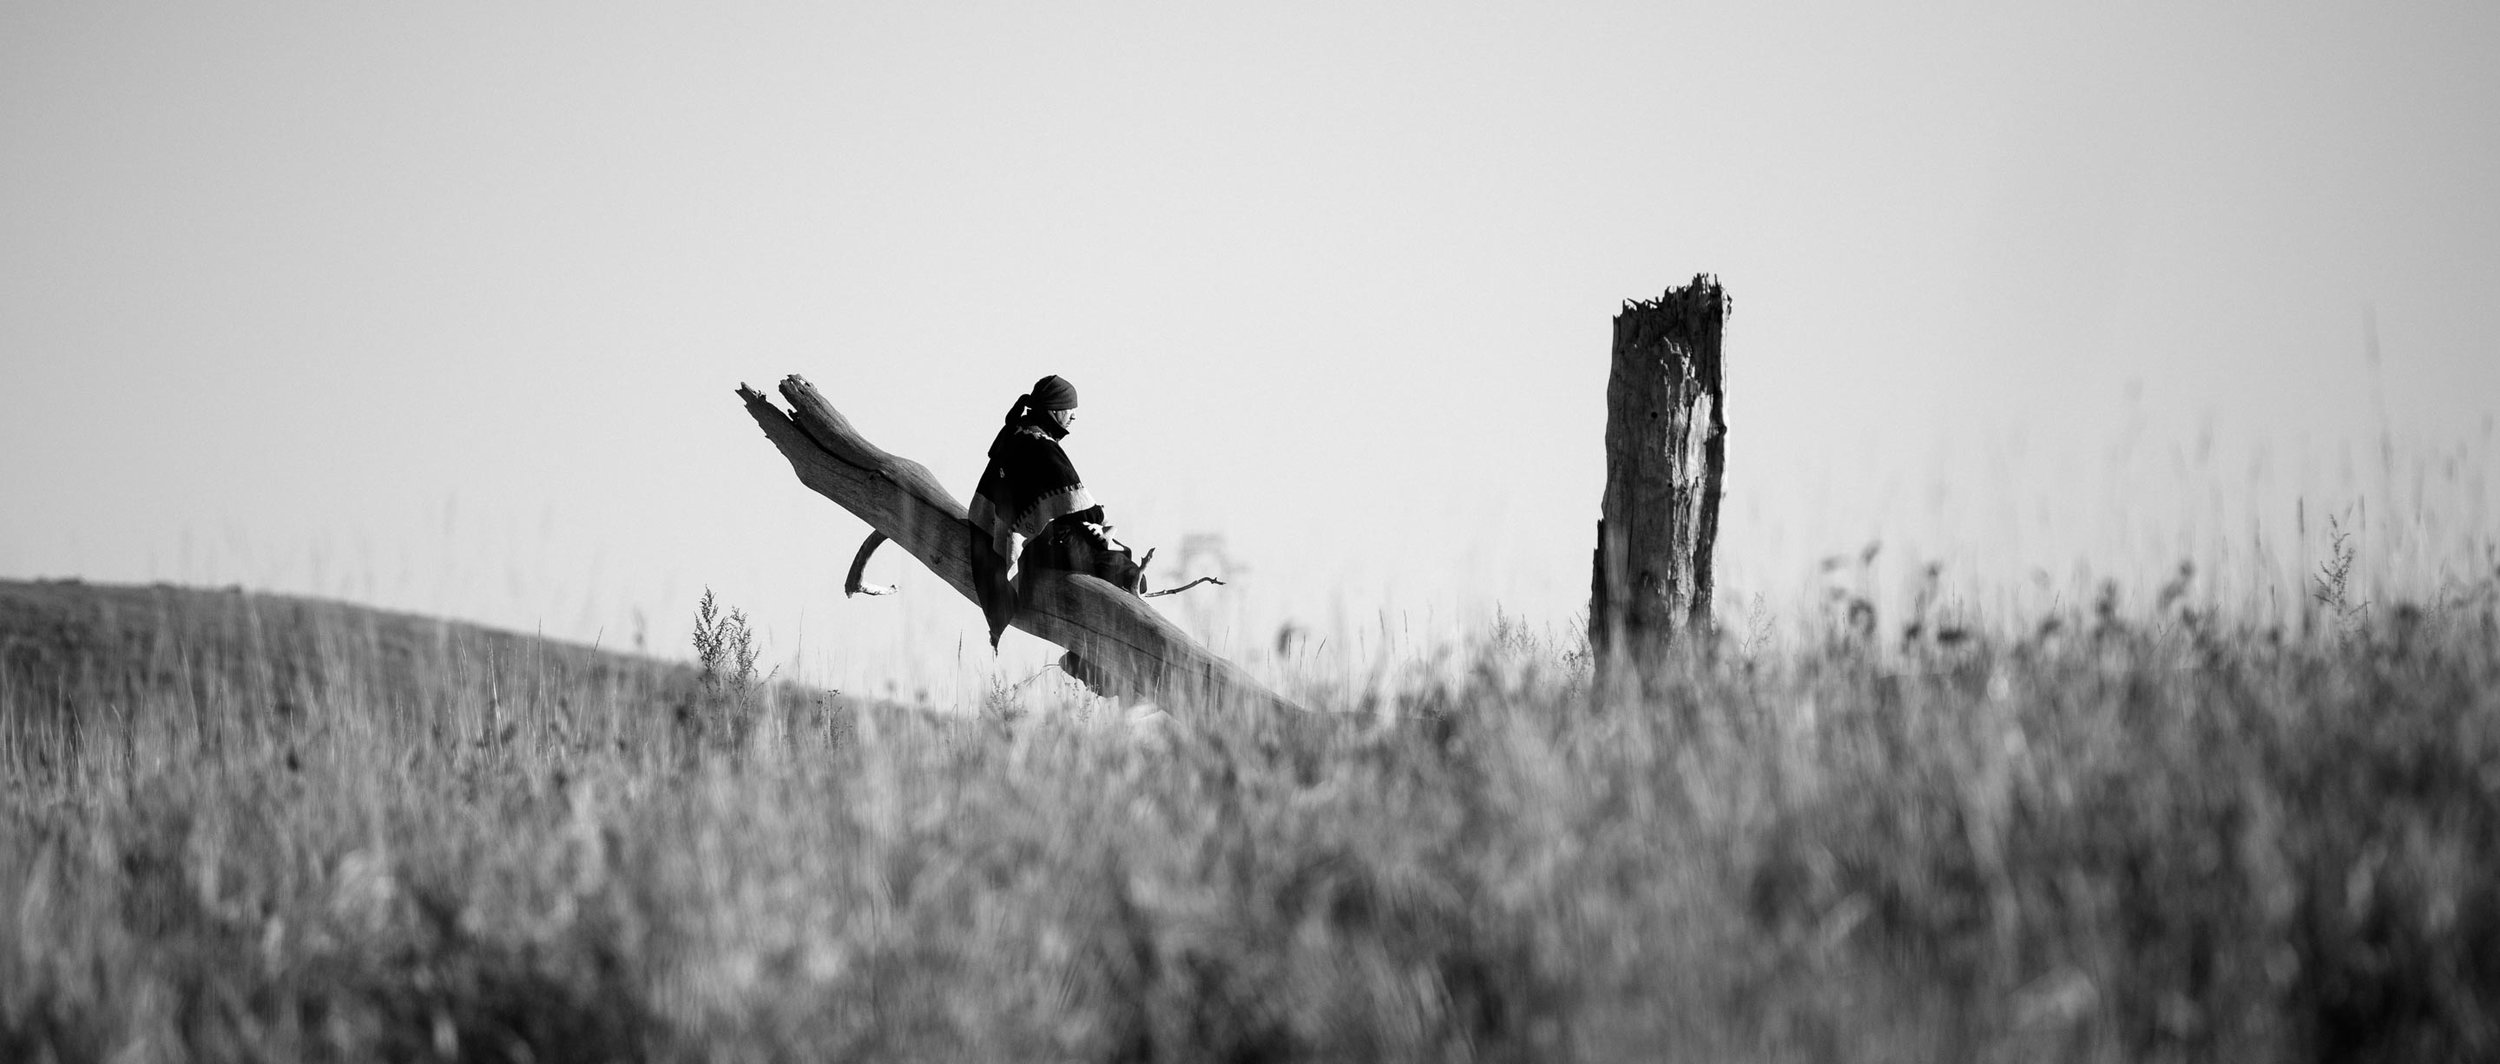 Standing_Rock_Nicholas_Small-1.jpg